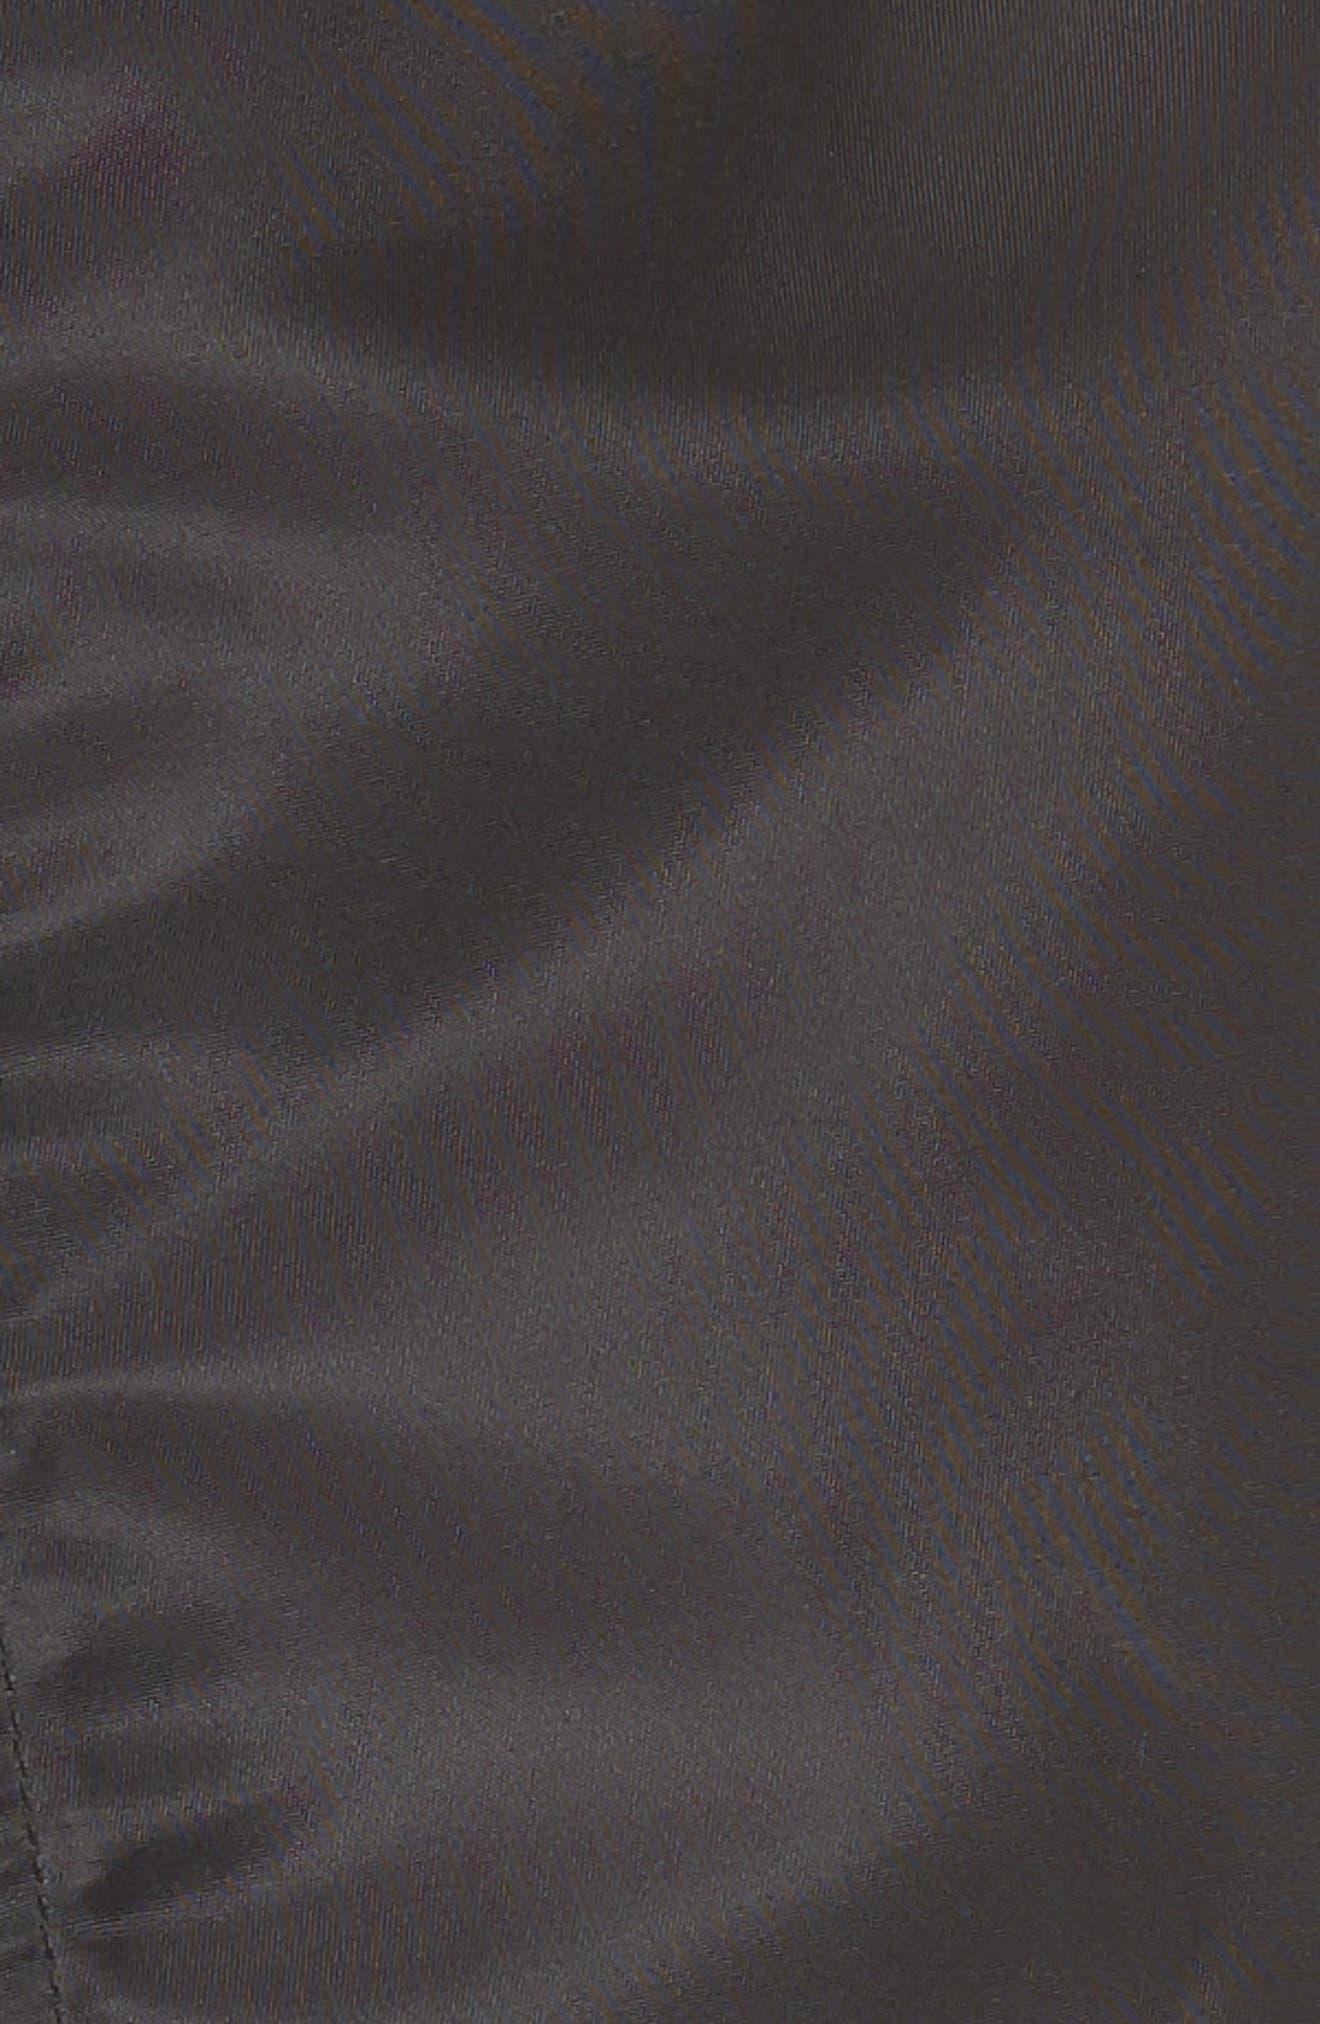 Mixed Media Bomber Jacket,                             Alternate thumbnail 6, color,                             001